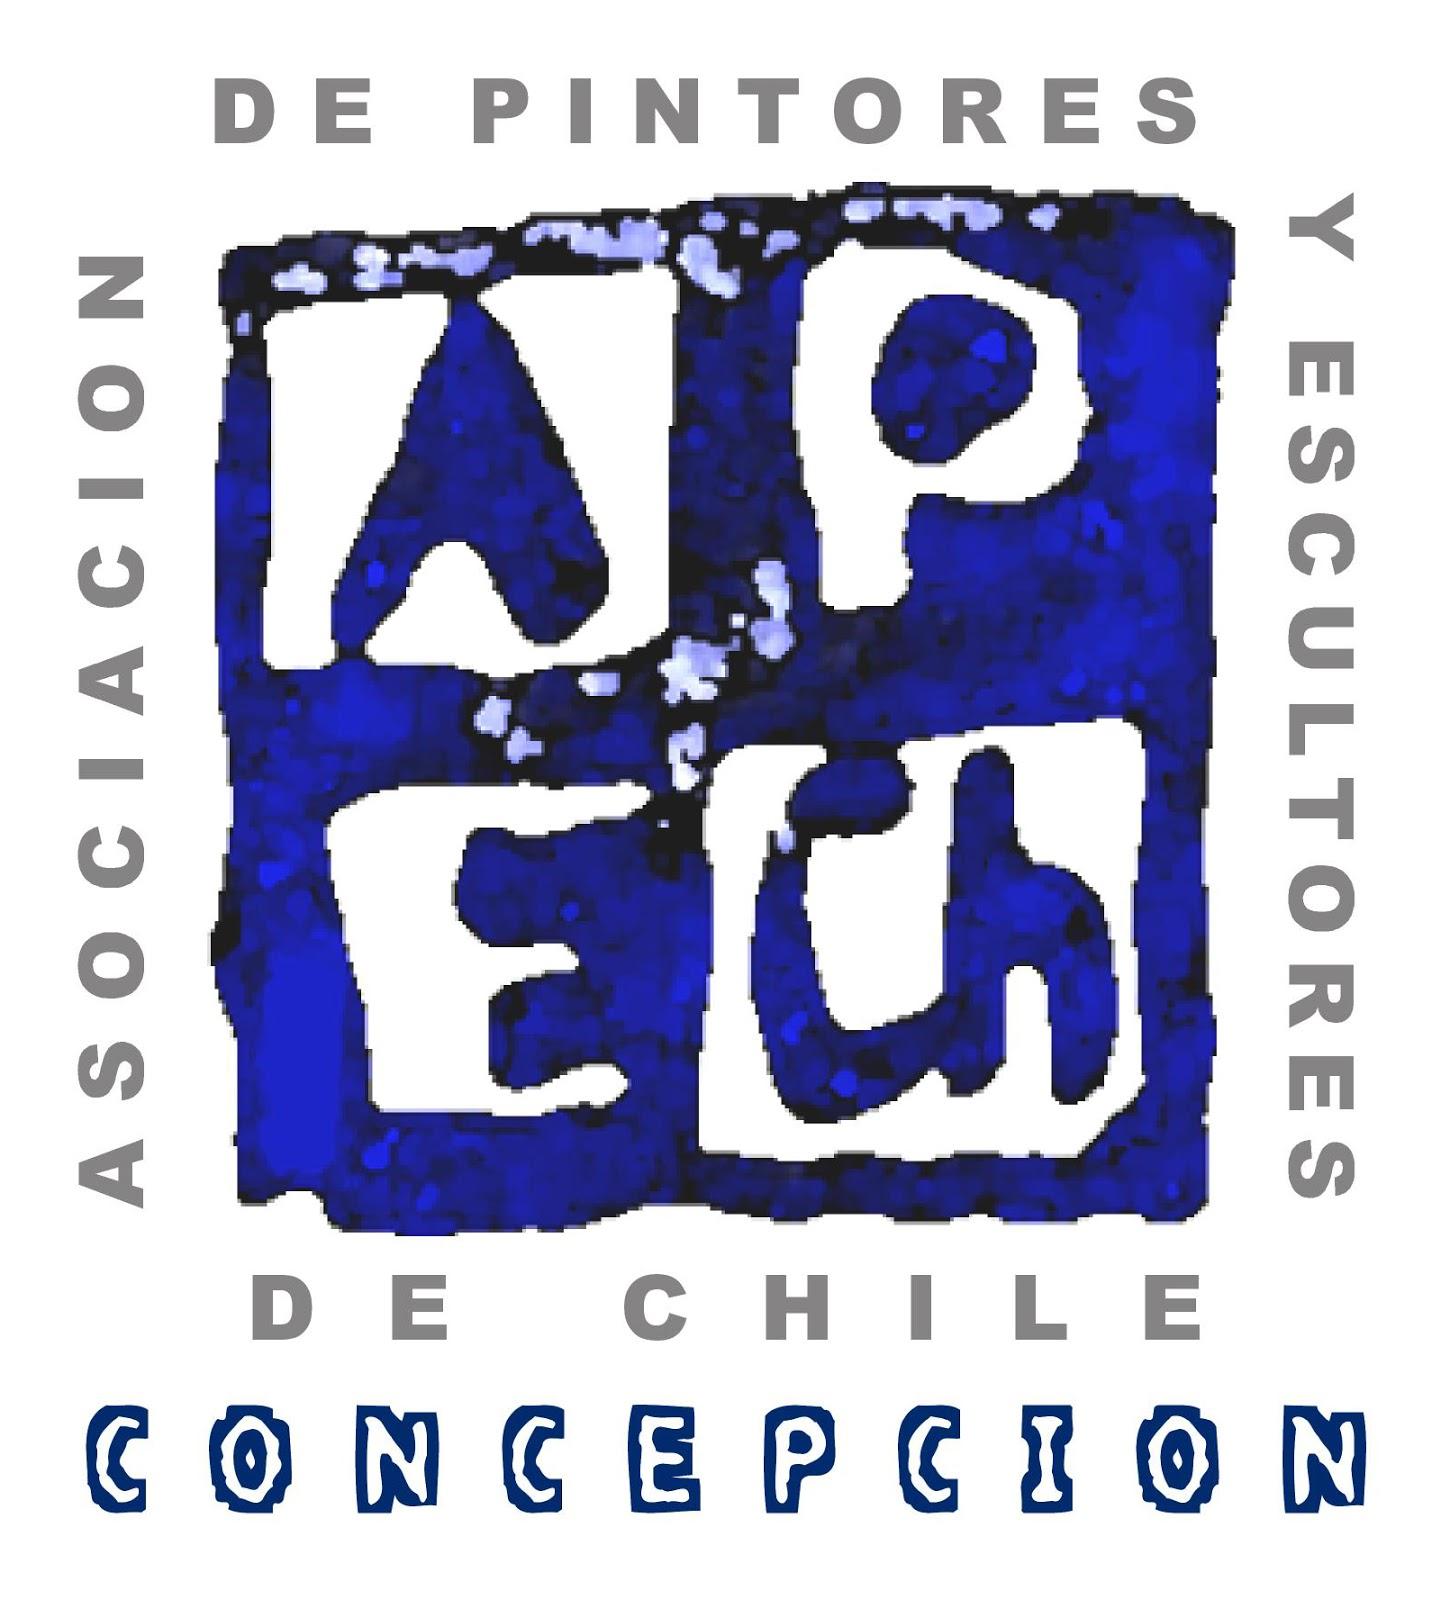 logo+apech+concepcion.jpg